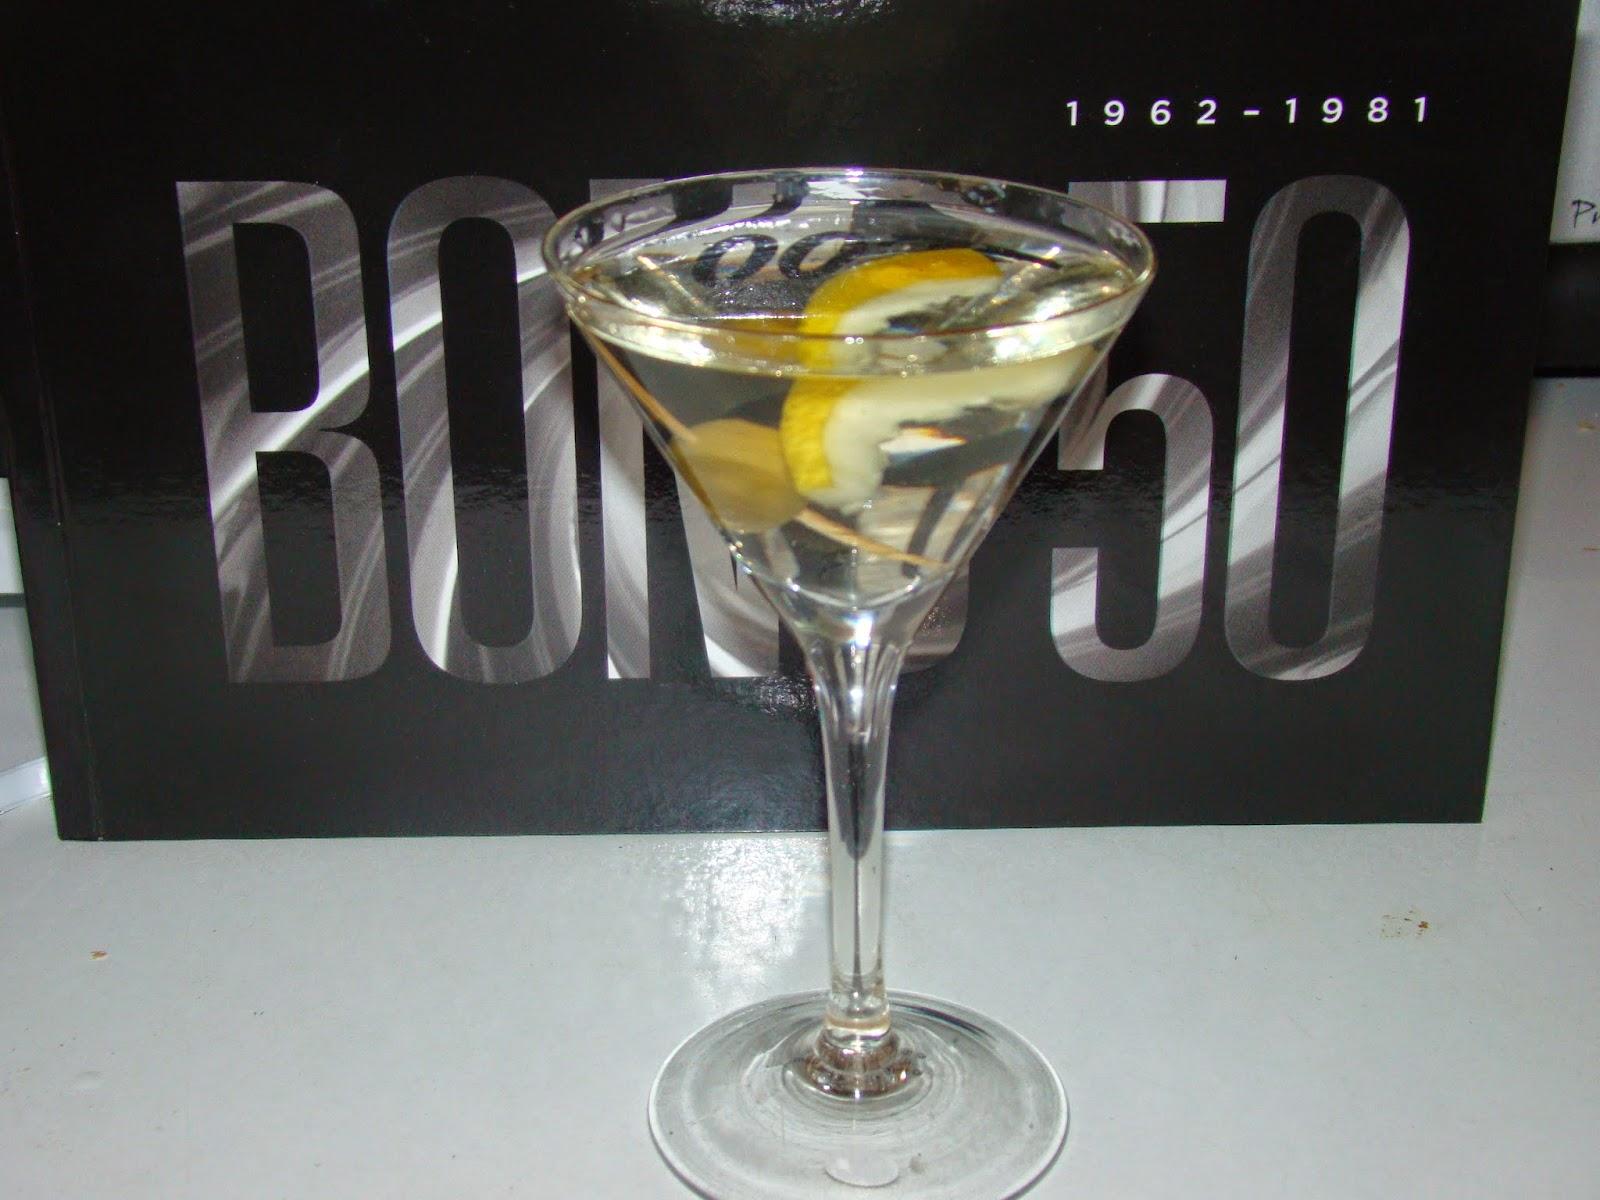 agent 007 martini